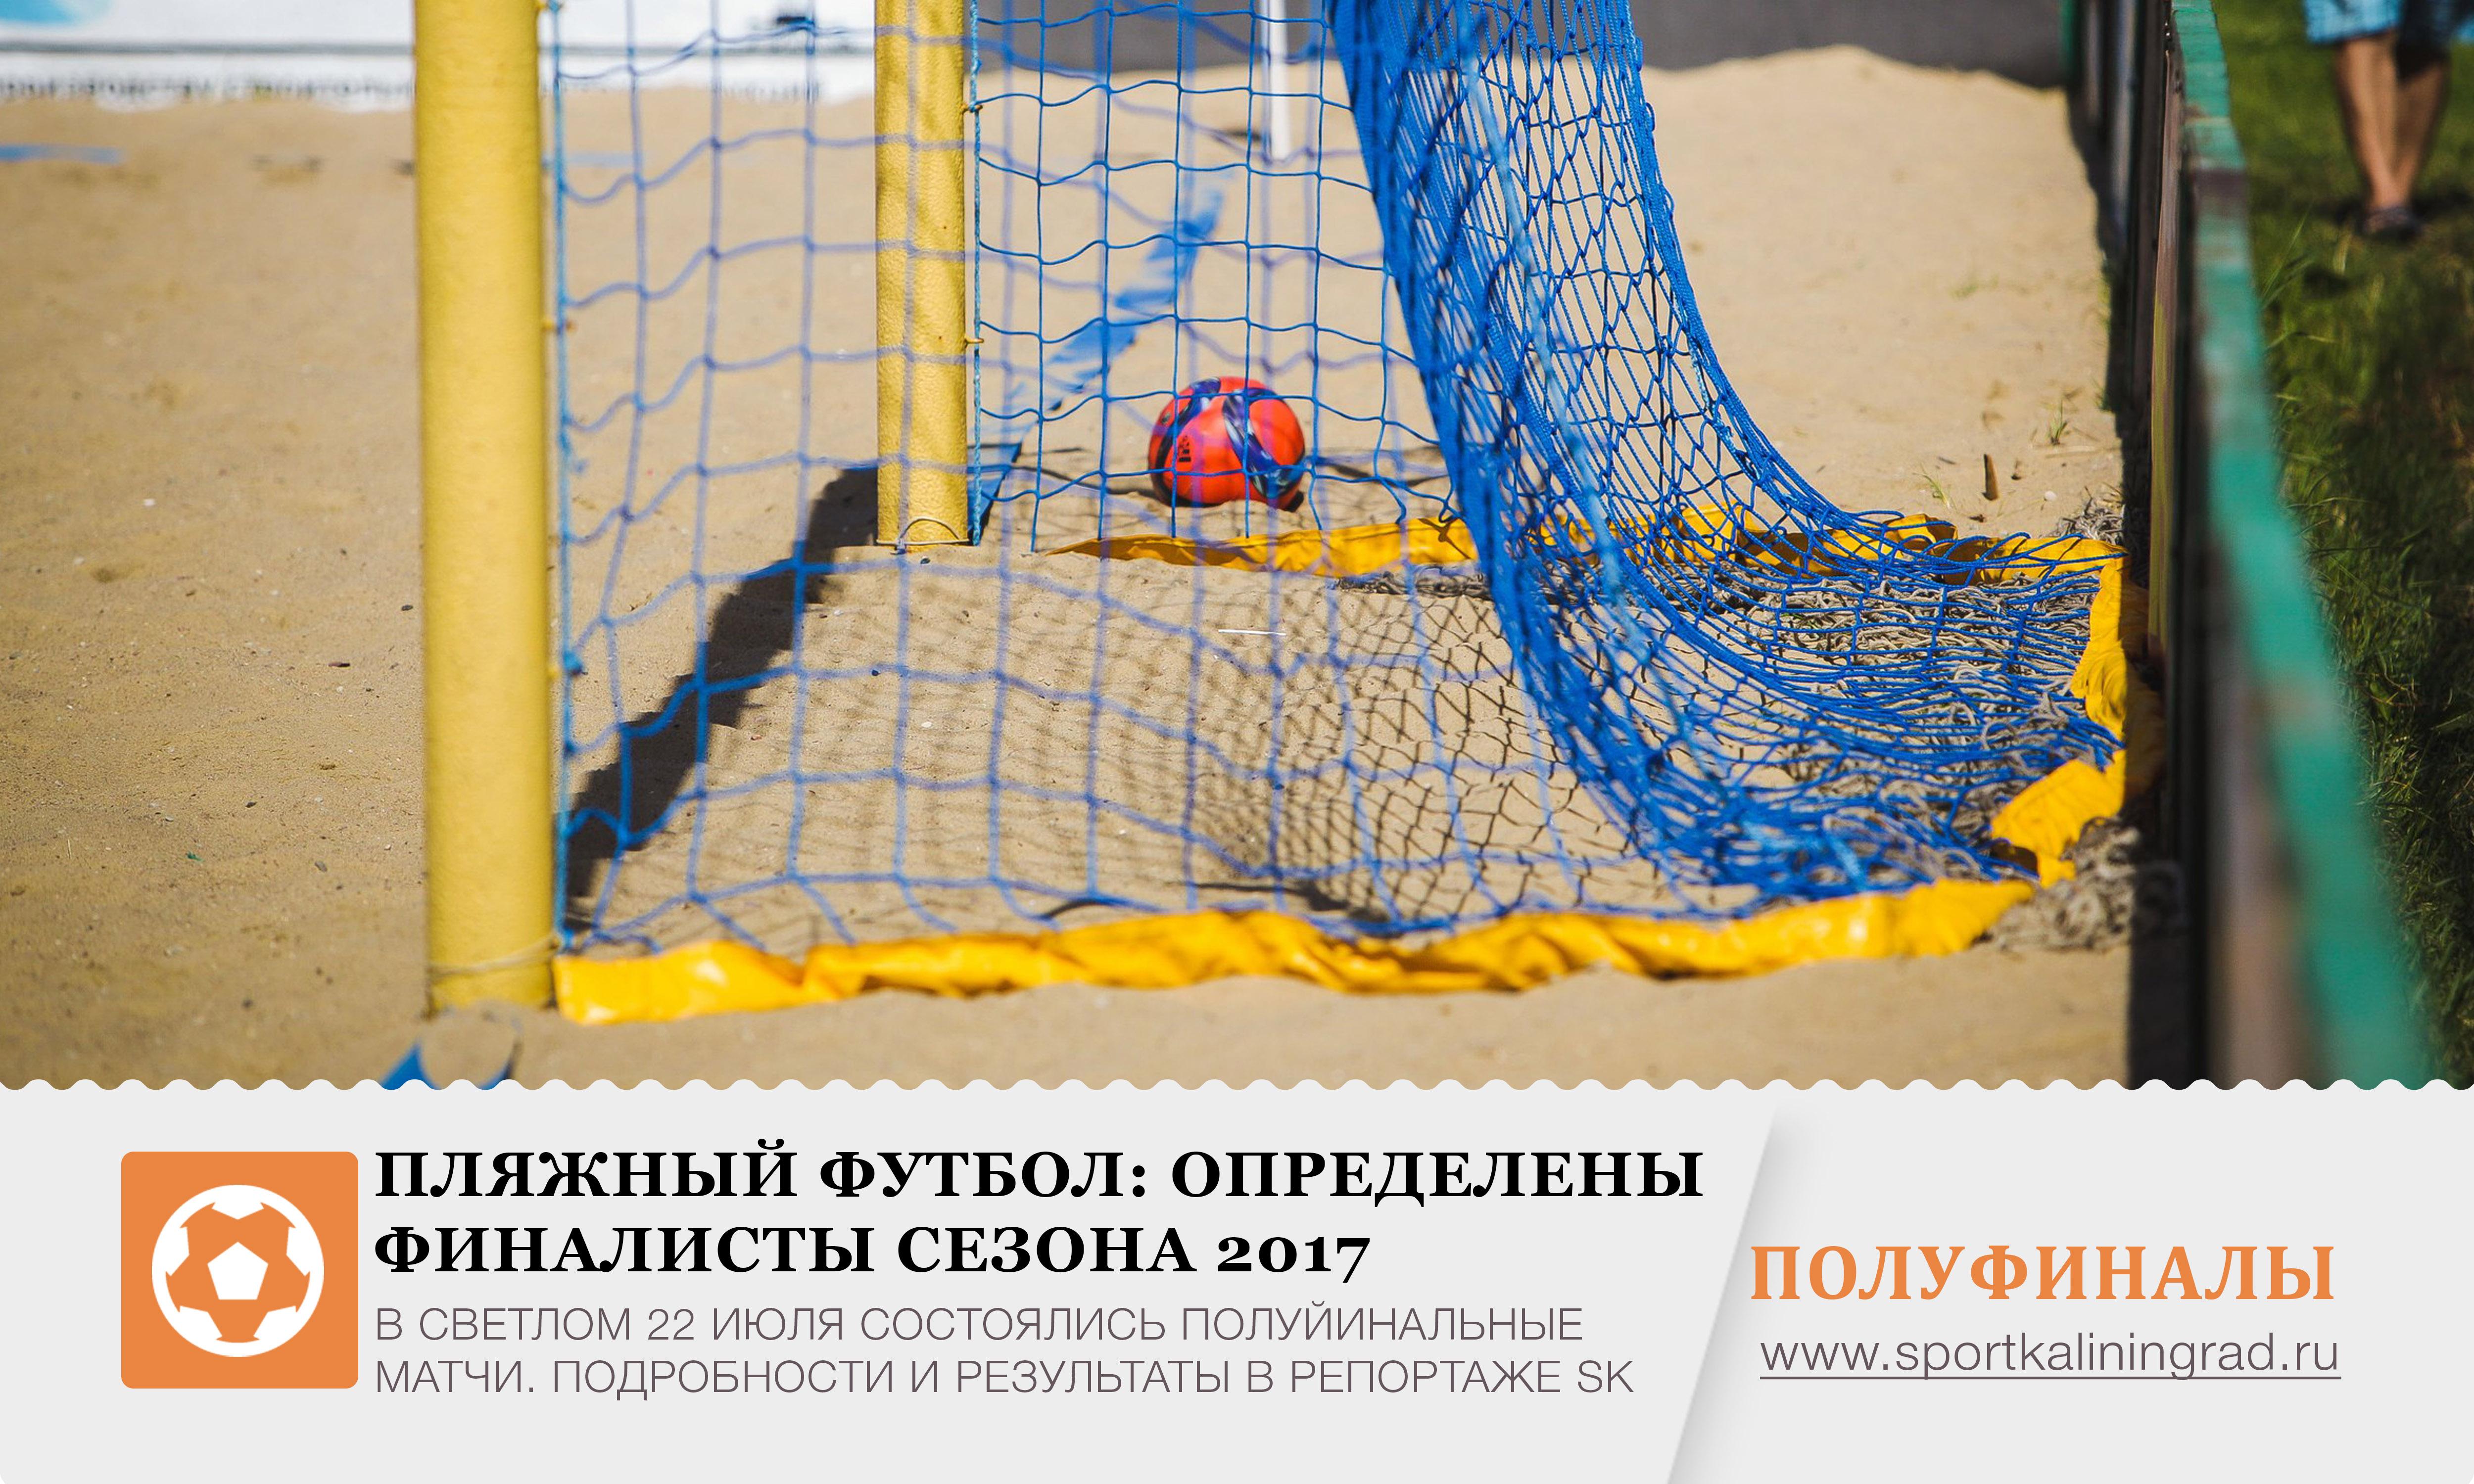 beachsoccer-kaliningrad-sezon-finalisti-2017-sportkaliningrad